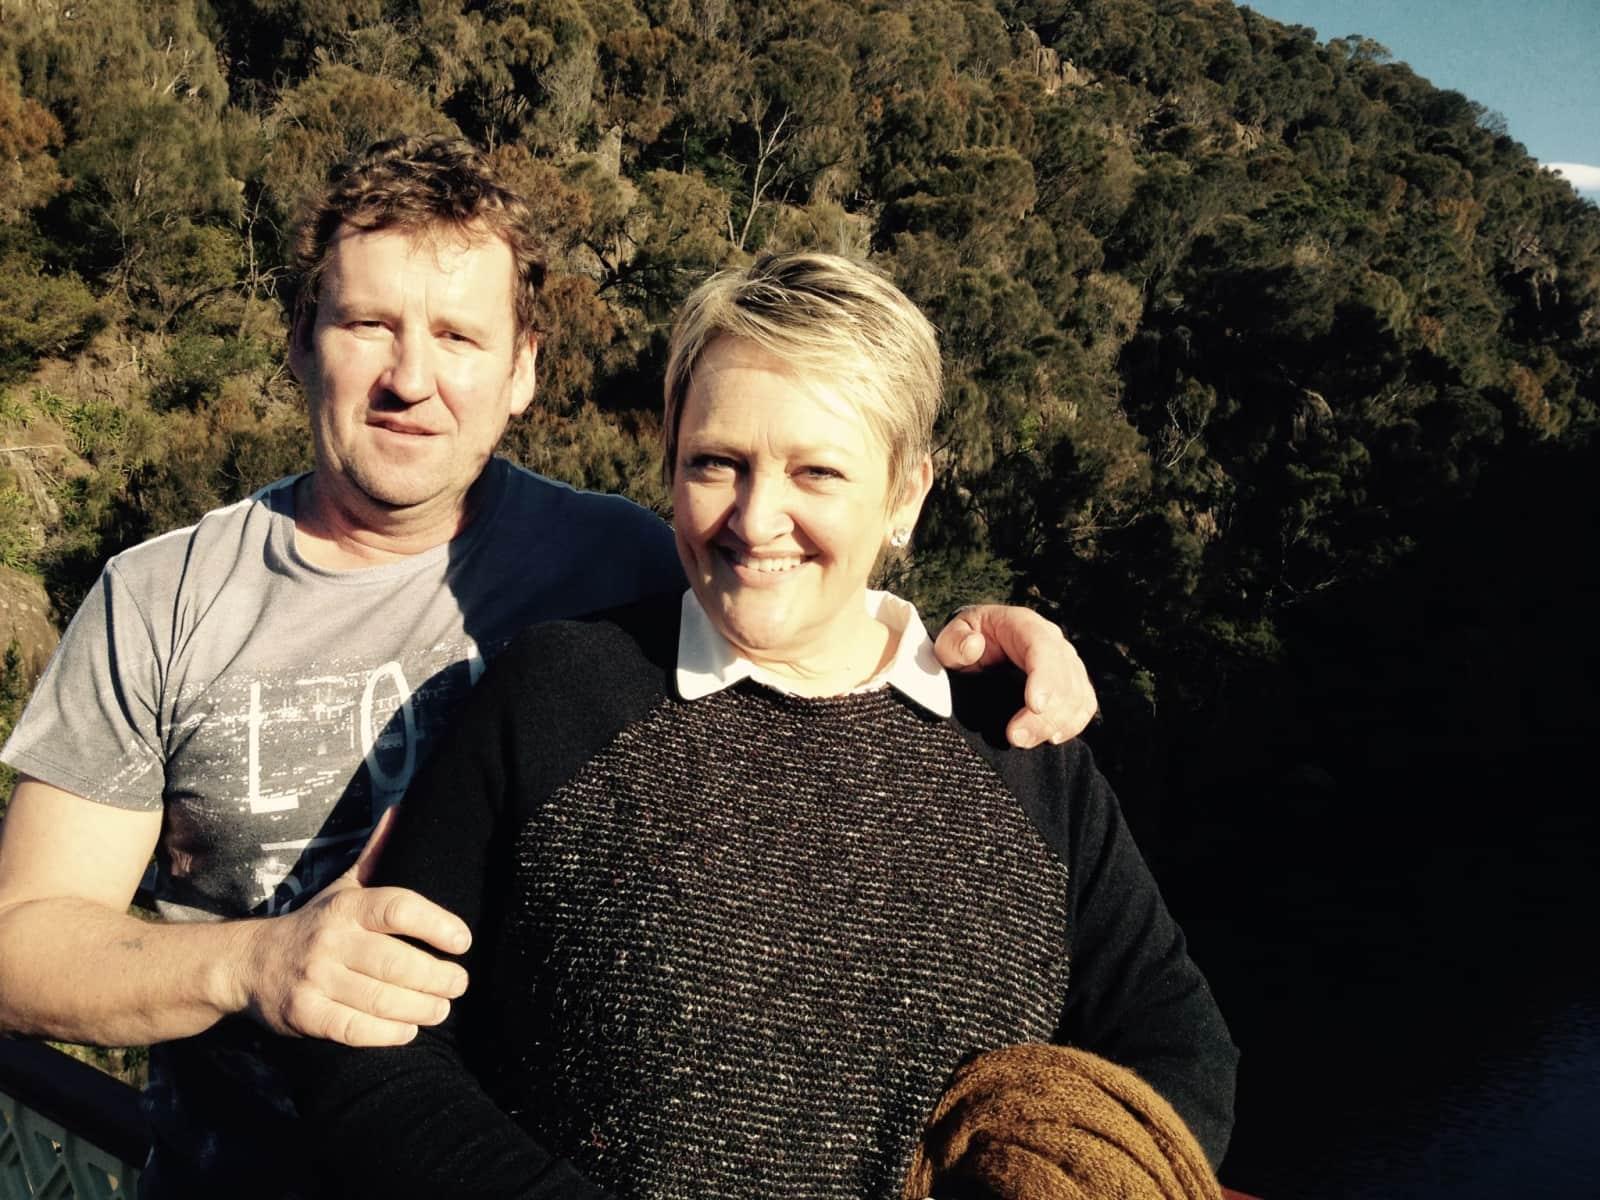 Michelle & Nicholas from Bendigo, Victoria, Australia